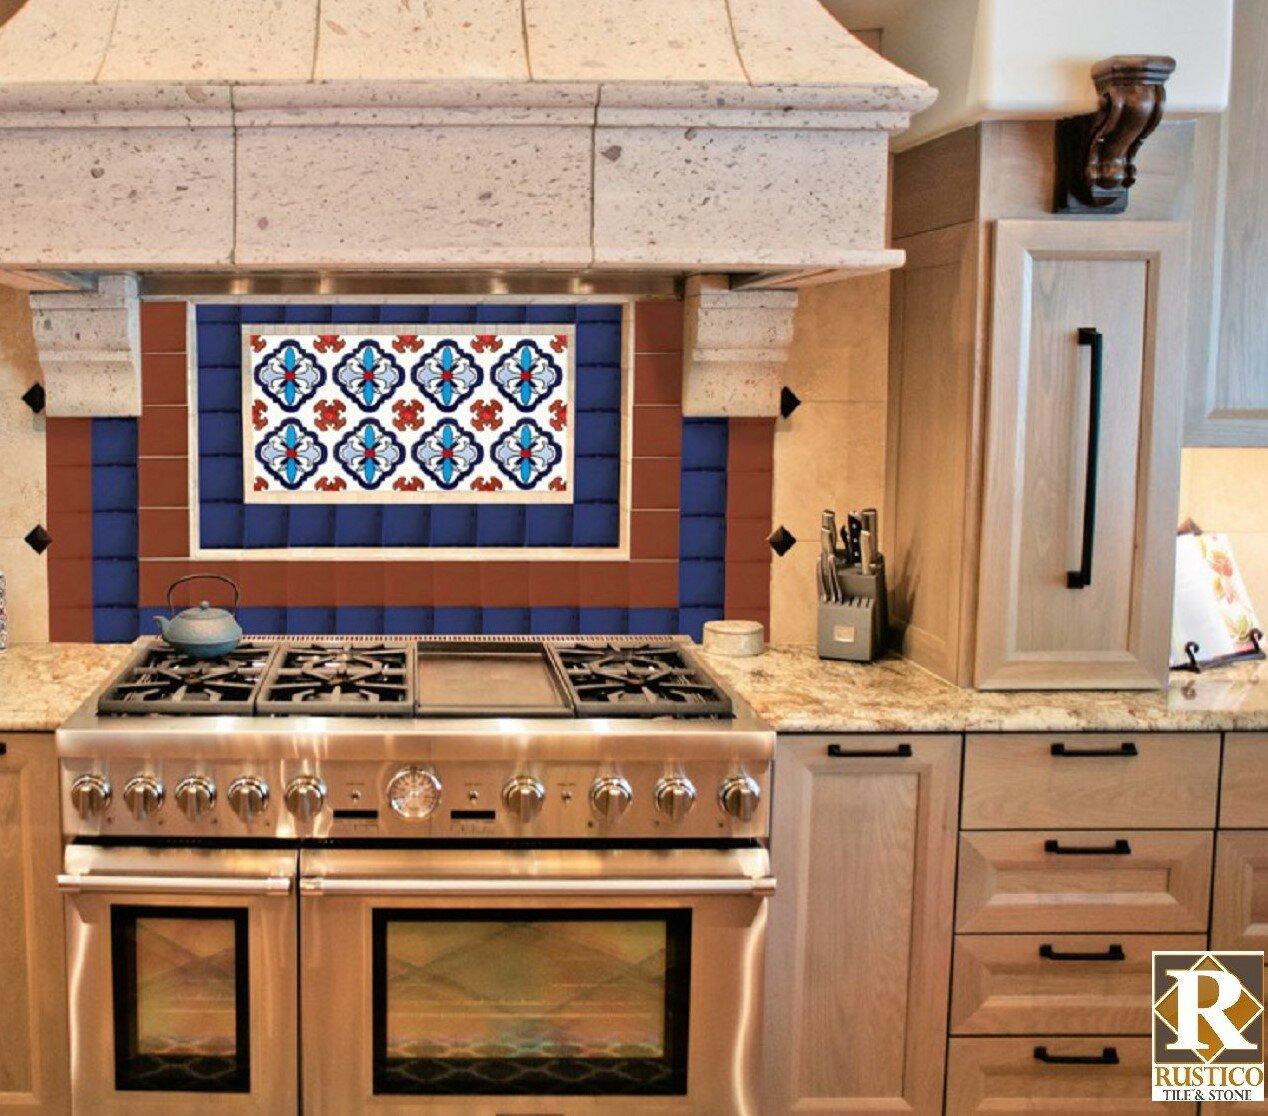 Rustico Tile Stone Terra Talavera 4 X 4 Ceramic Field Tile Wayfair,Tiny House For Sale With Land Nc